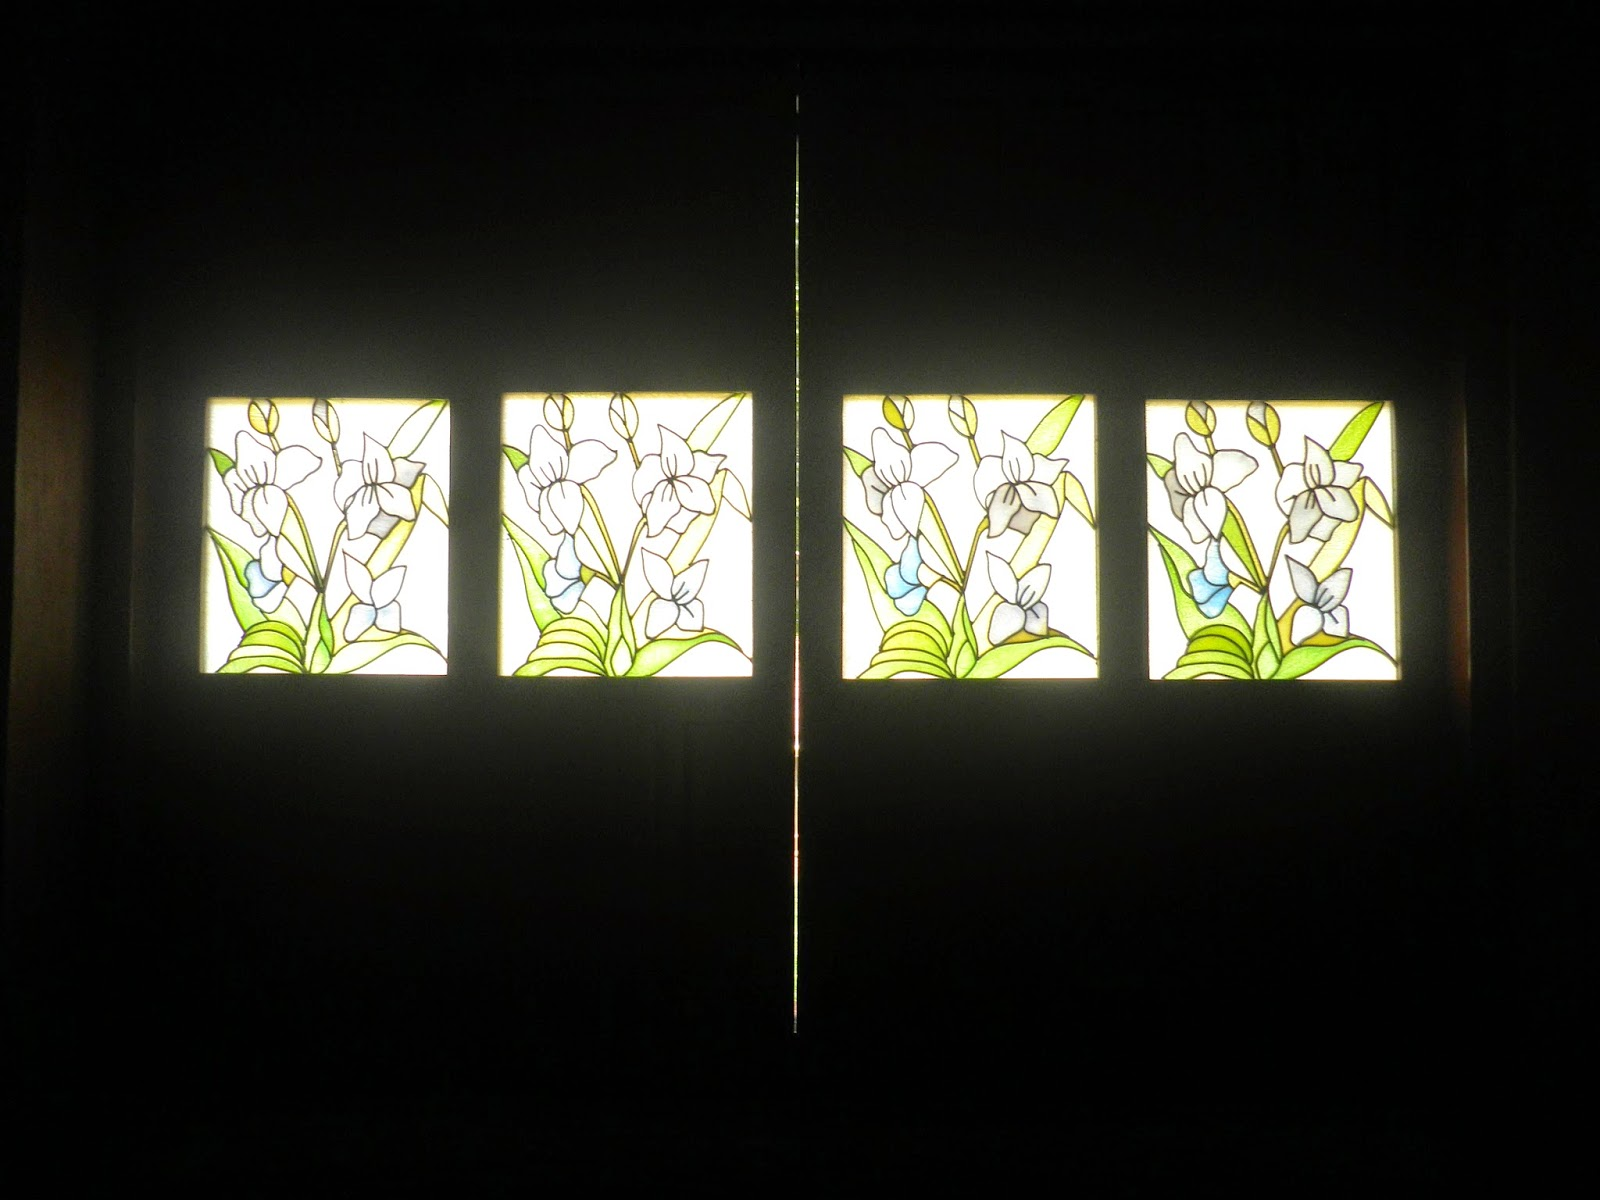 Dekora Glass Art Stained Glass Fiberglass Art Etched Glass Mirror Wall Decors Philippines March 2014